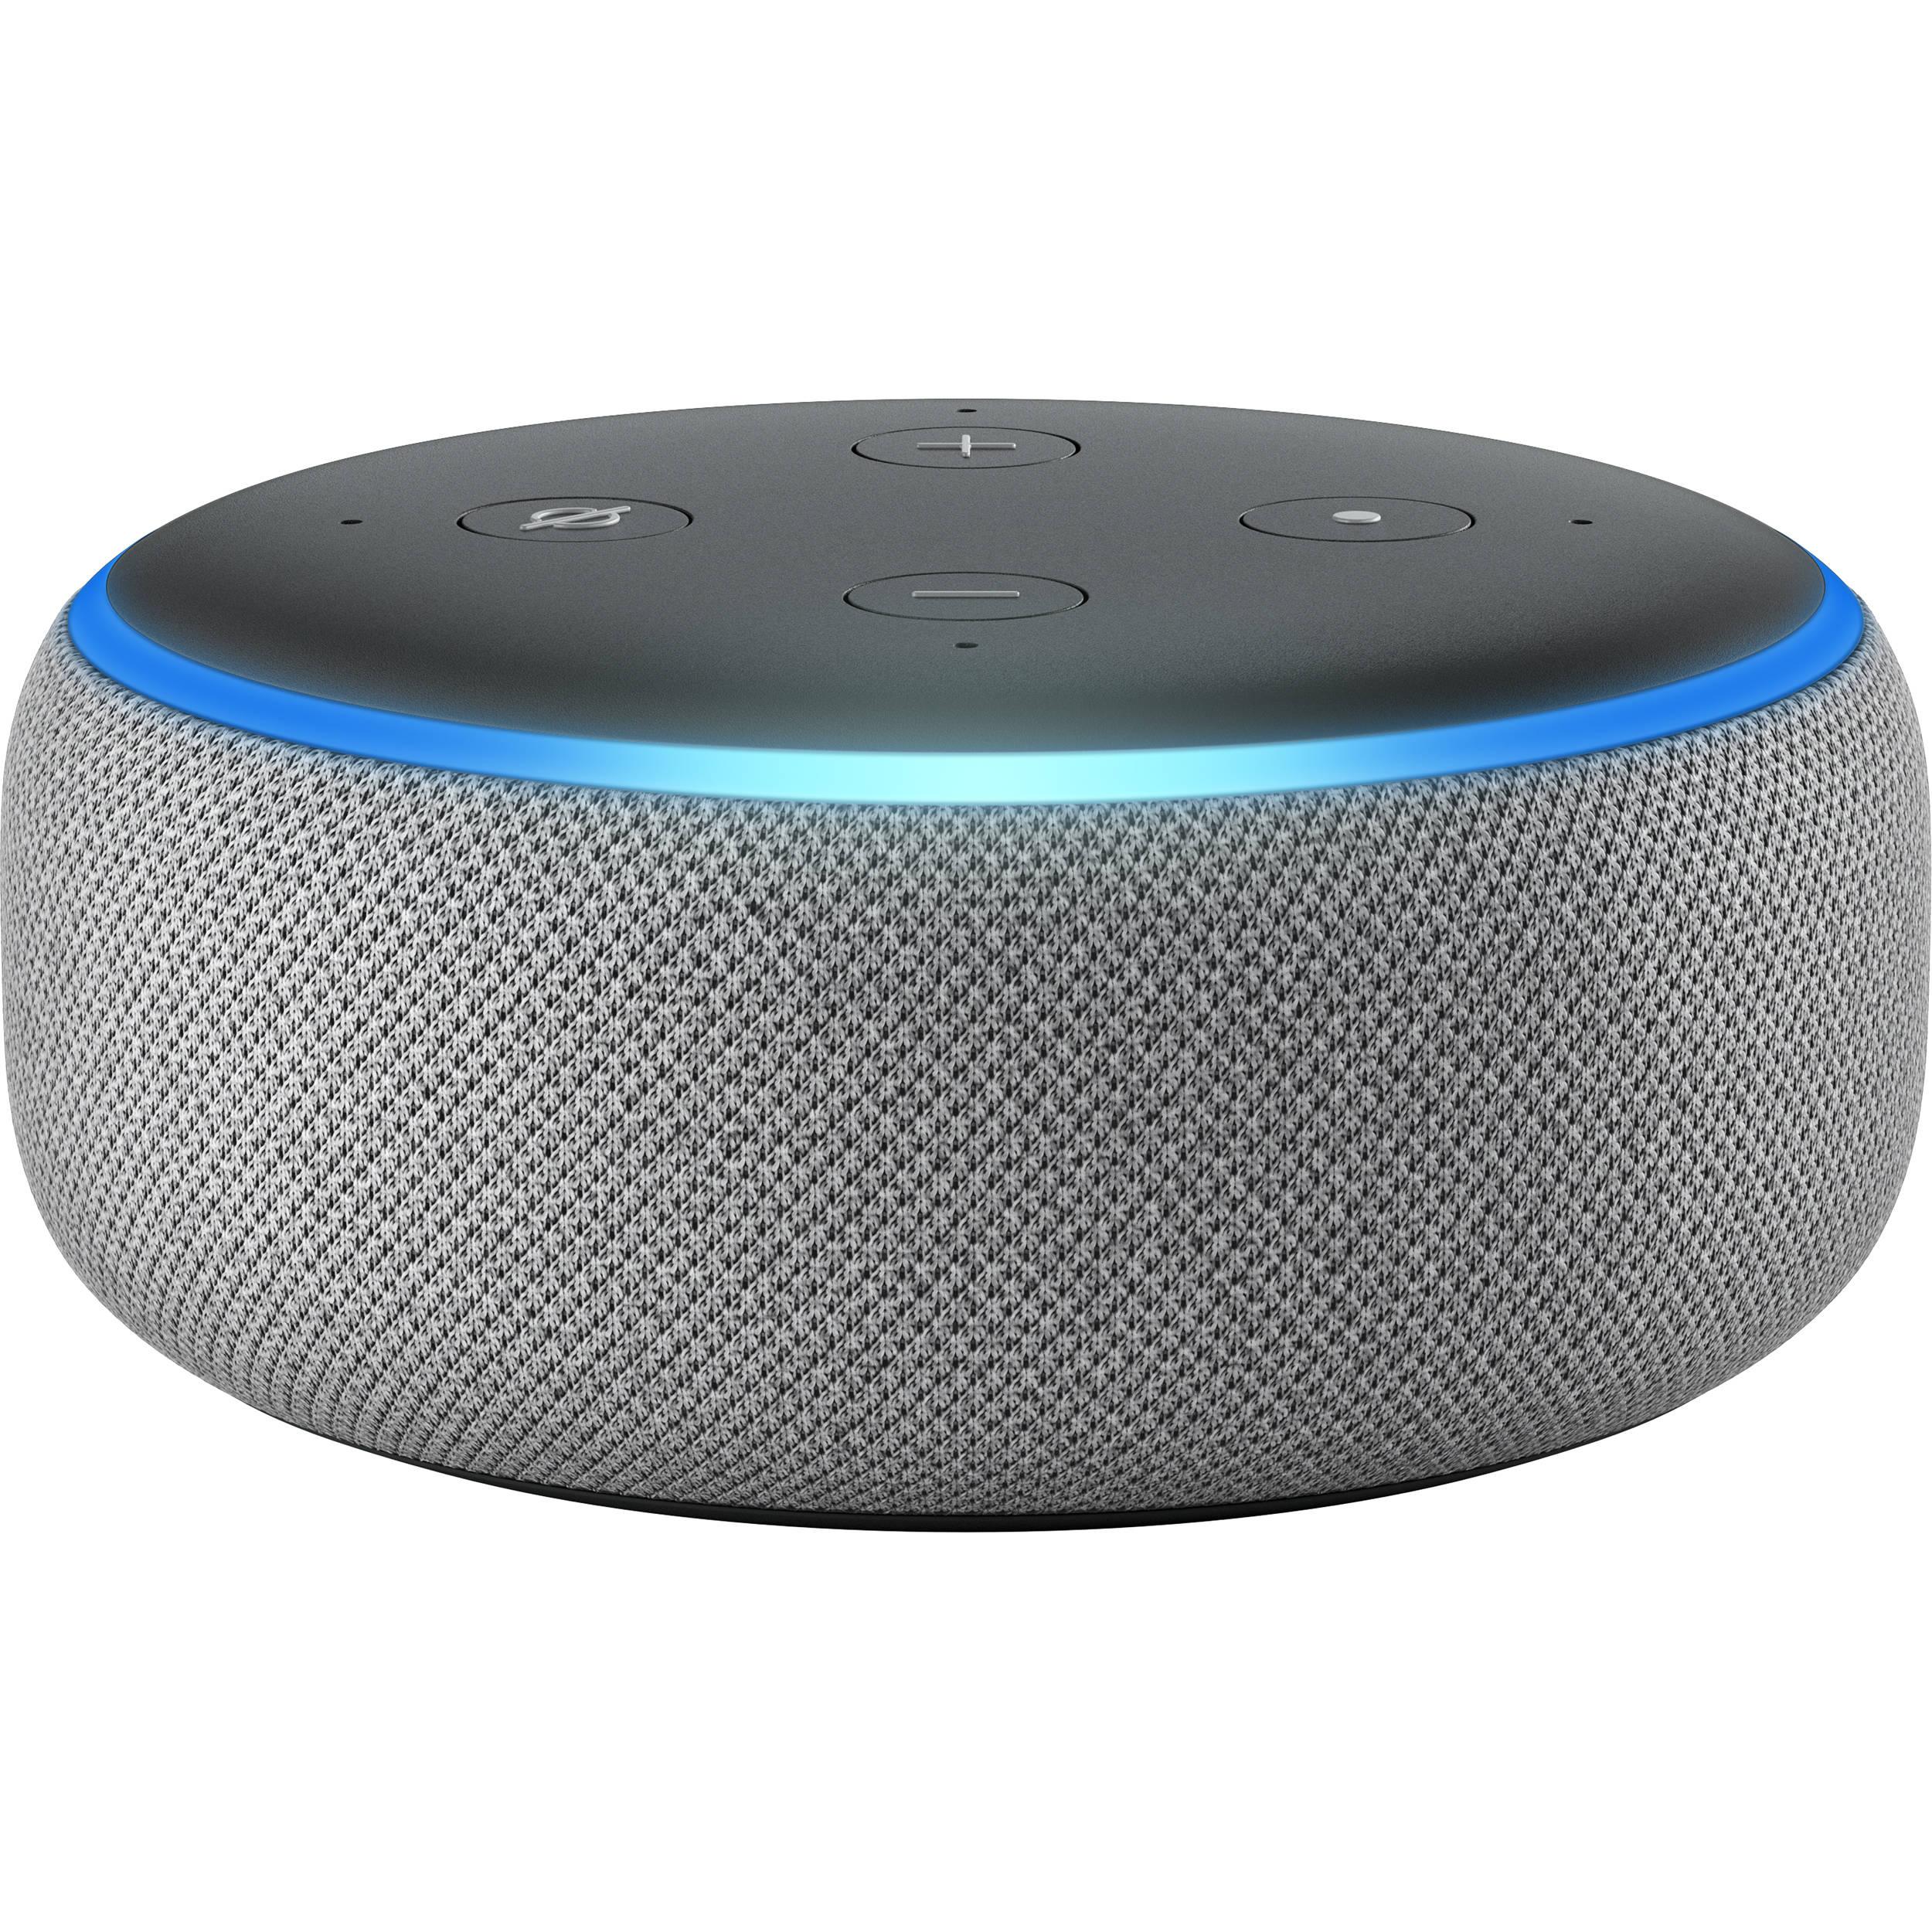 Amazon Echo Dot 3rd Generation Heather Gray B0792k2bk6 B H